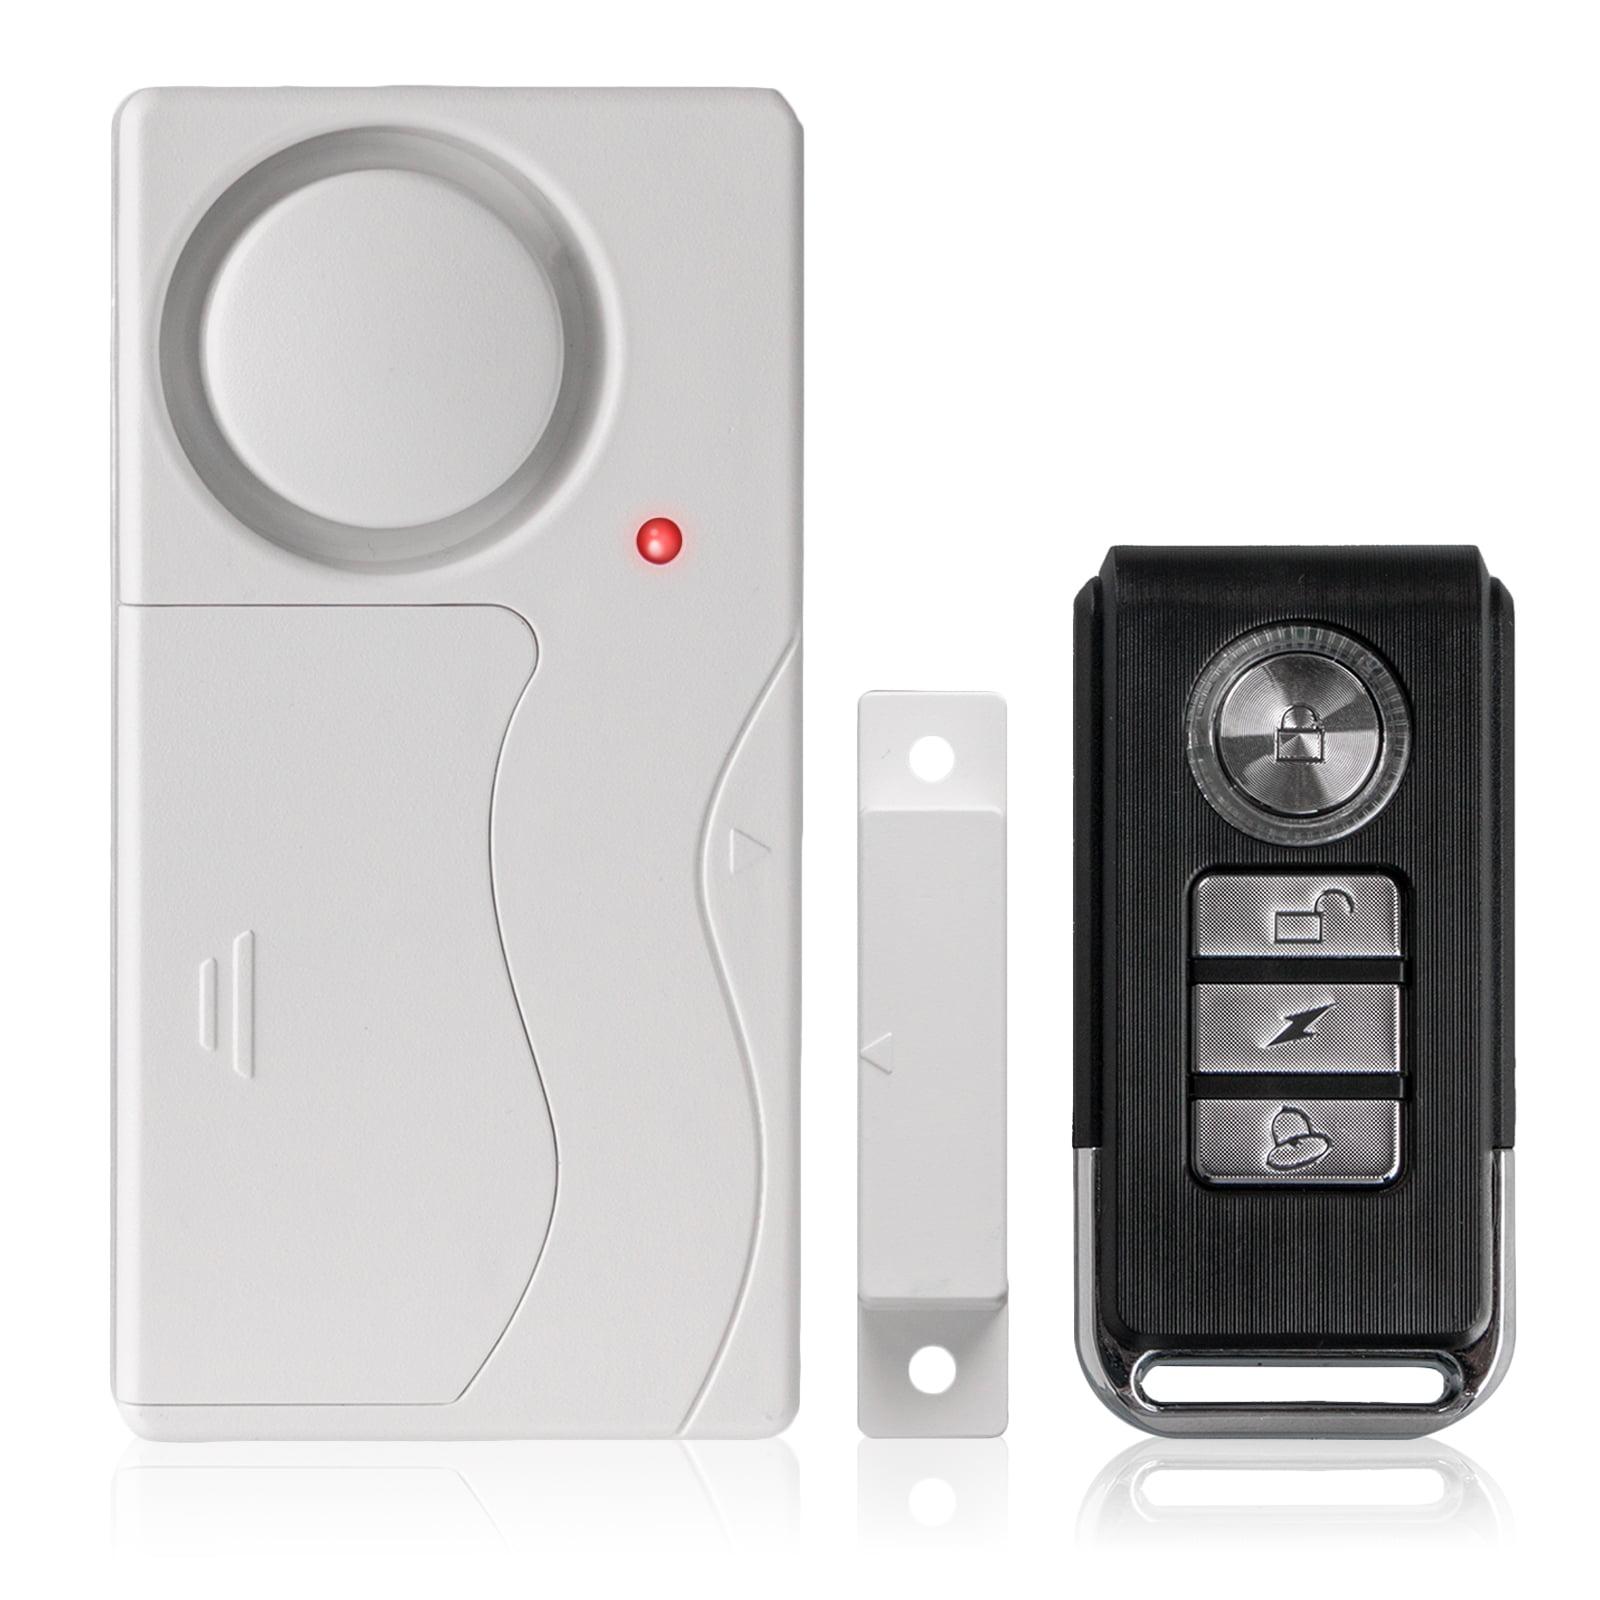 Wireless Alarm System, EEEKit Wireless Magnetic Anti-Theft Remote Control Alarm System Door Window Home Entry Security Burglar Bell Alarm